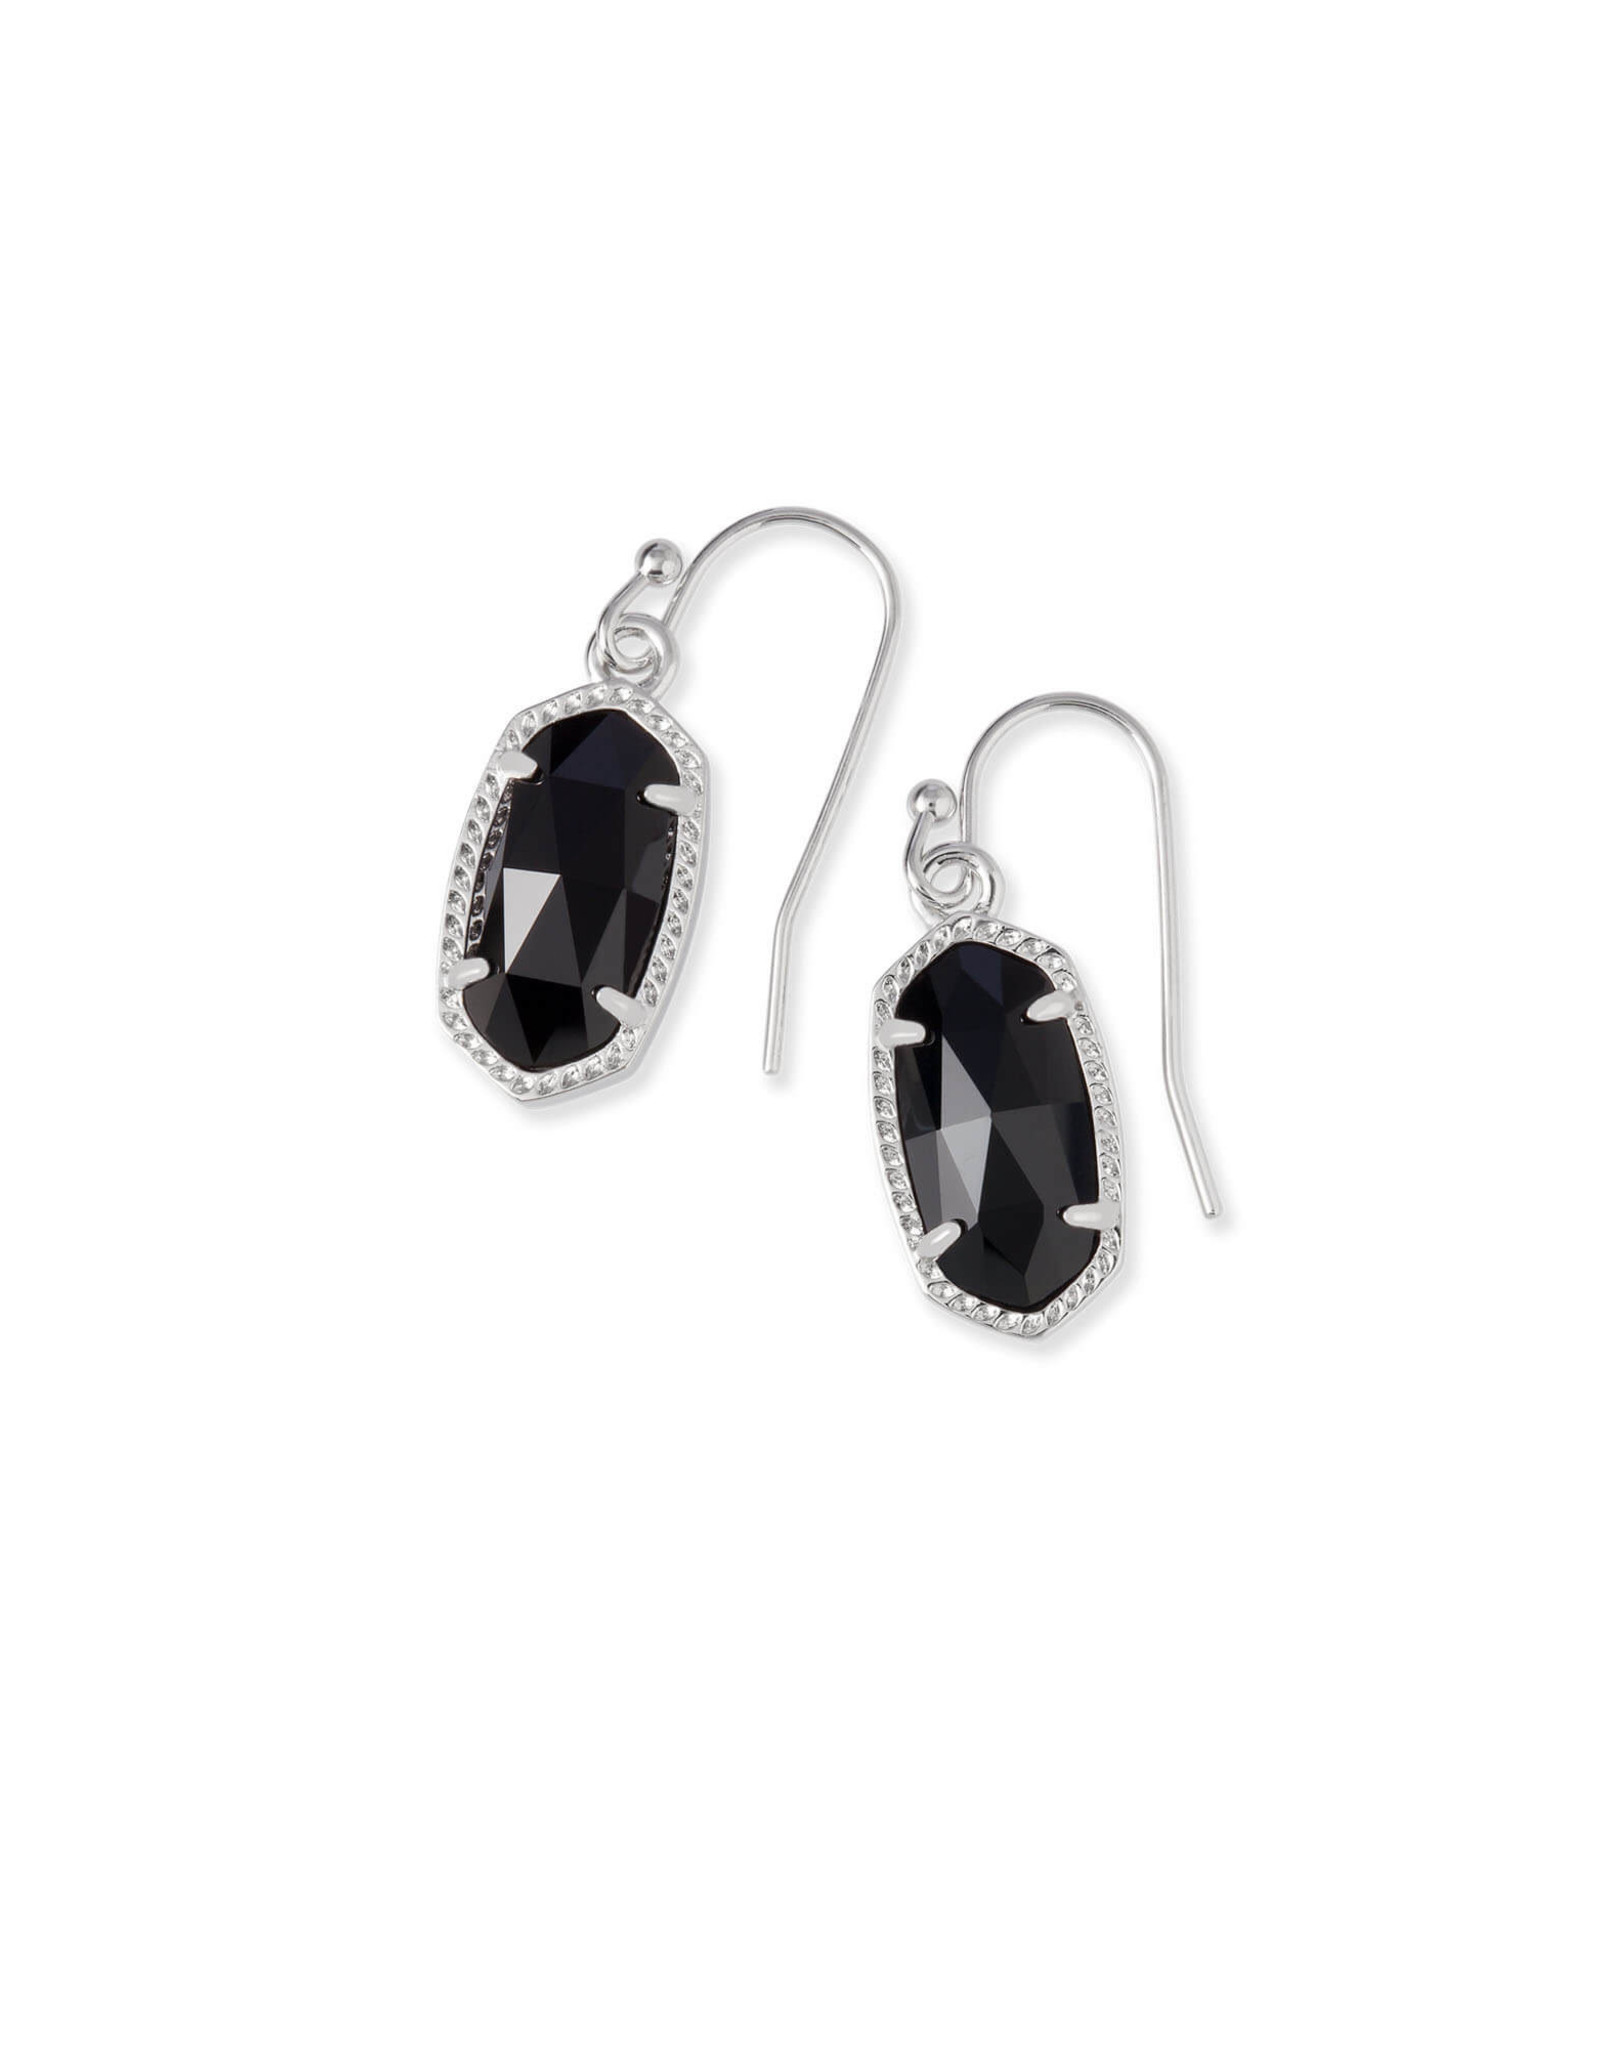 Kendra Scott Lee Earring - Black/Rhodium